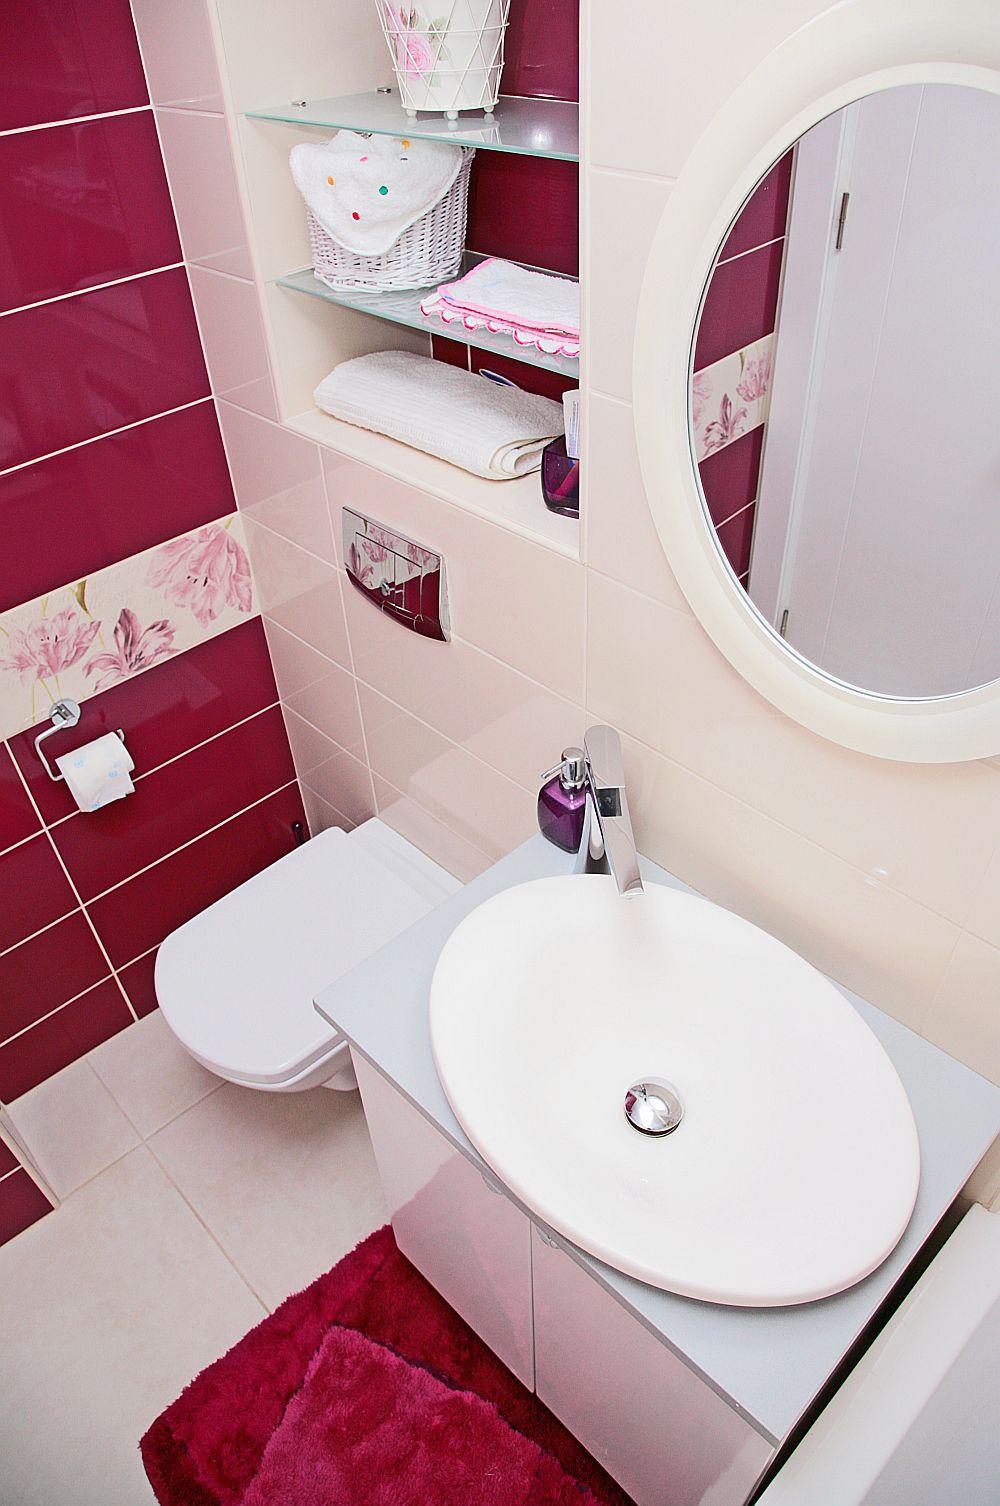 adelaparvu.com despre amenajare apartament Bucuresti, design interior Alia Bakutayan si Daniel Tufis - Valdecor (2)